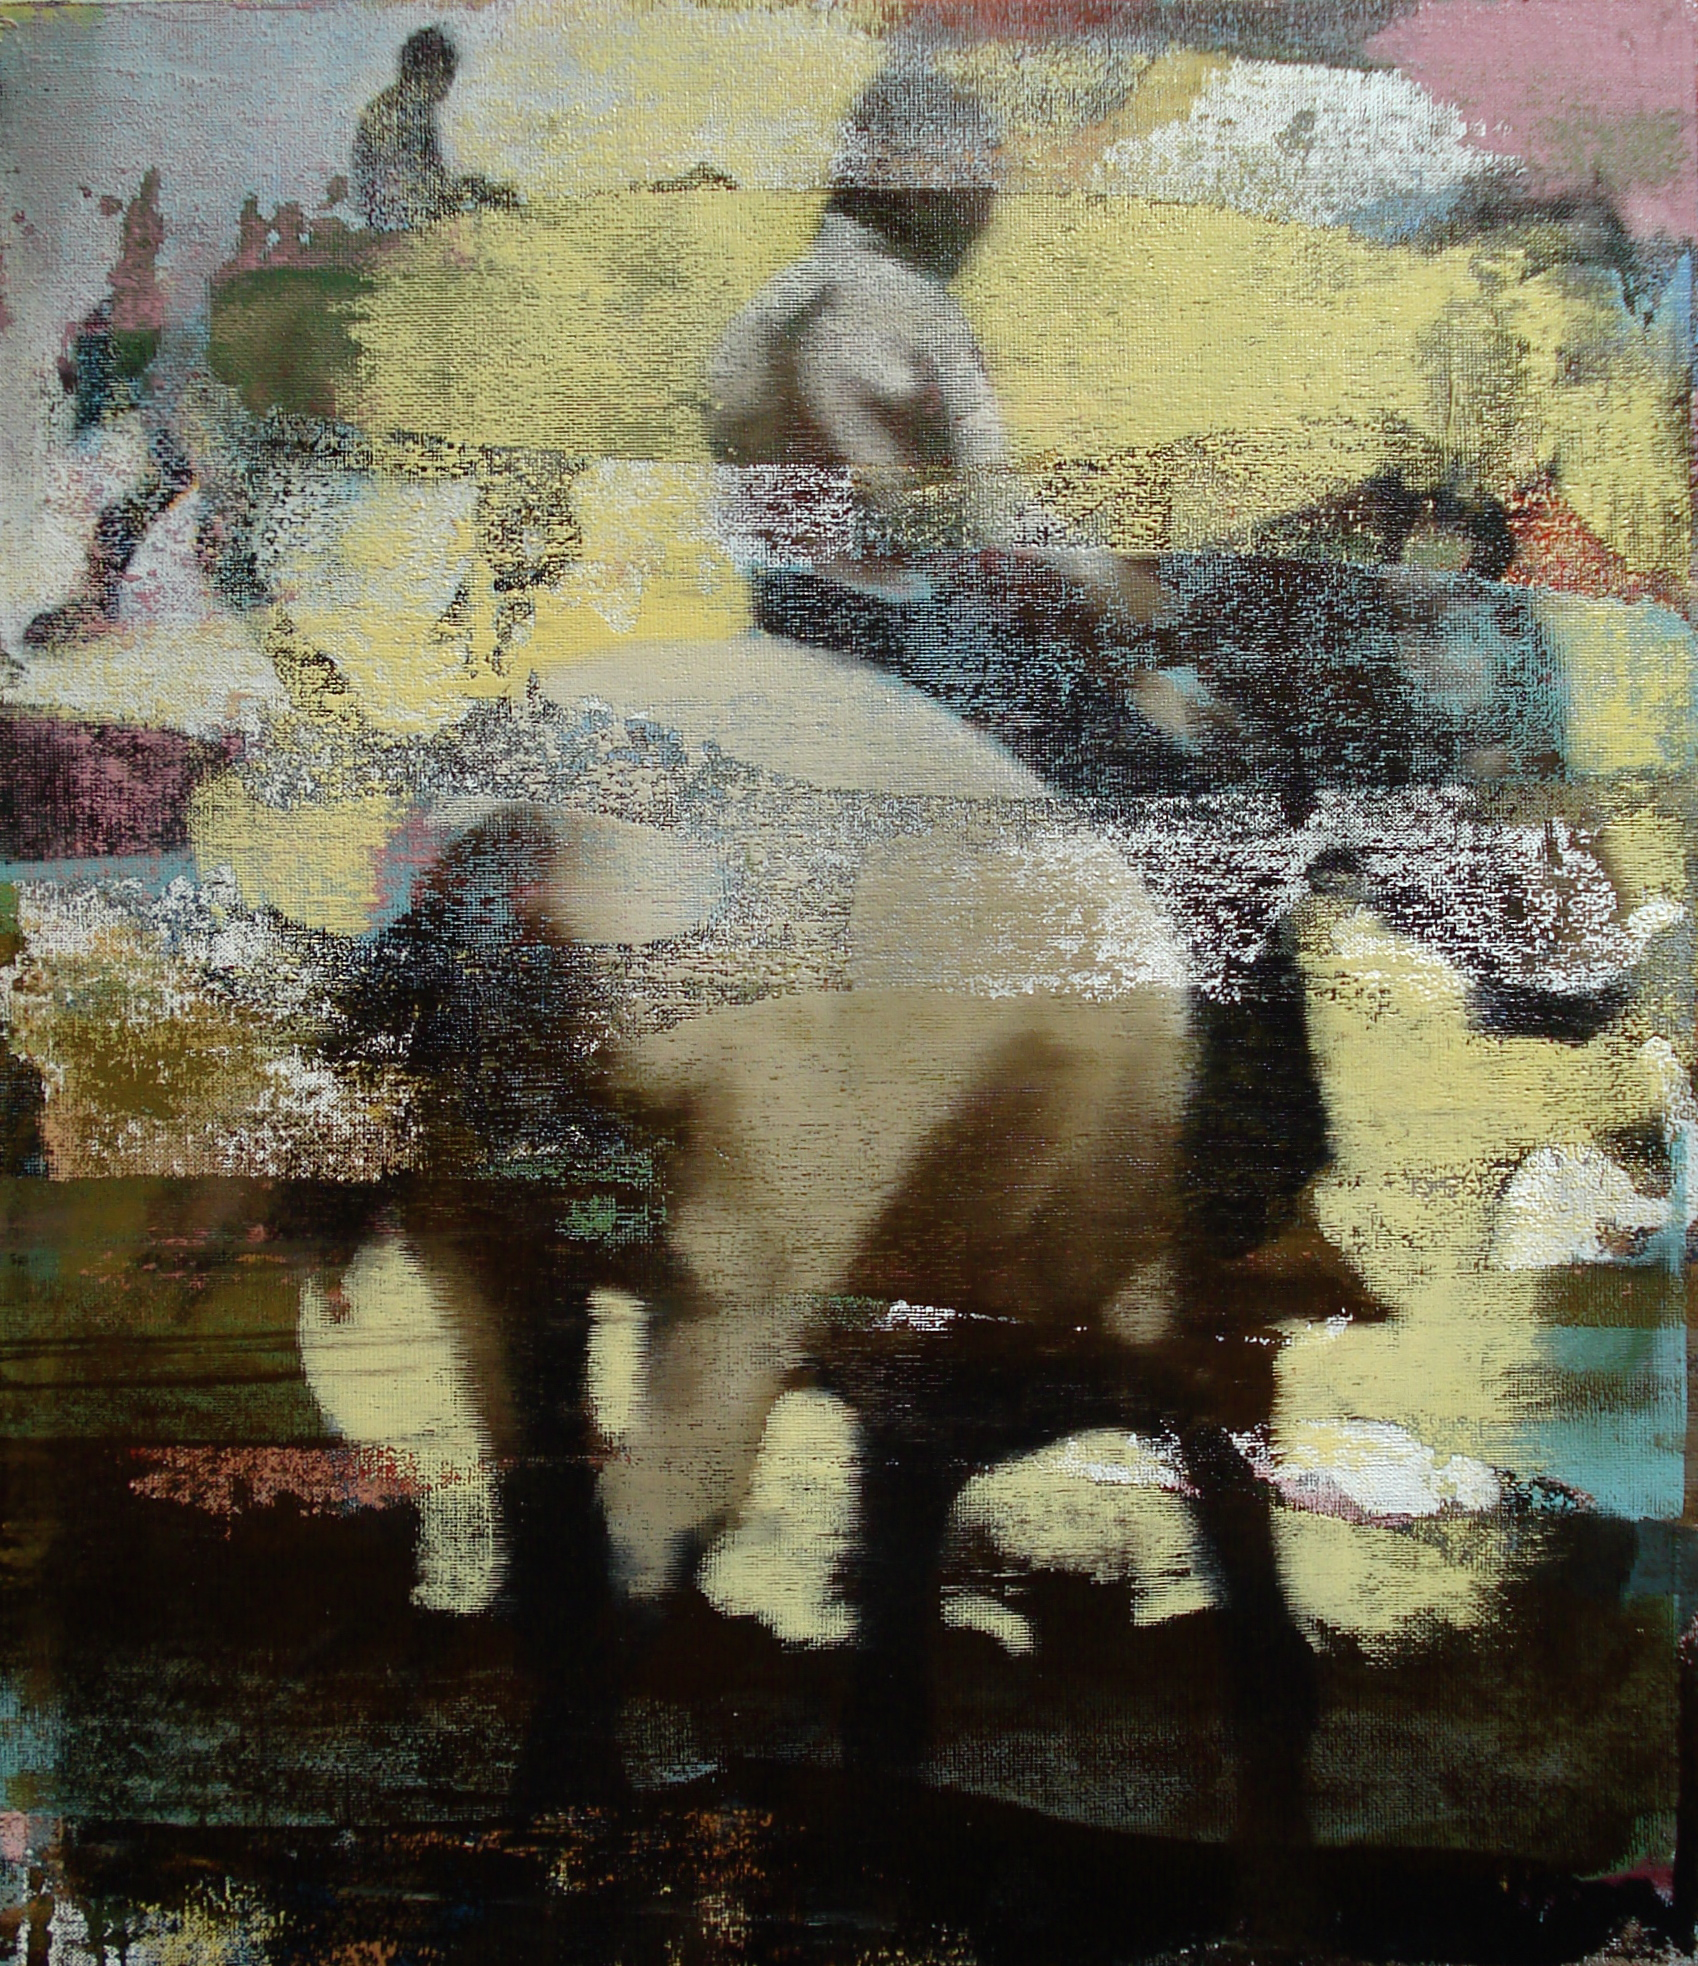 "Late Ride, Oil on Linen on Panel, 2011, 30"" x 26"""